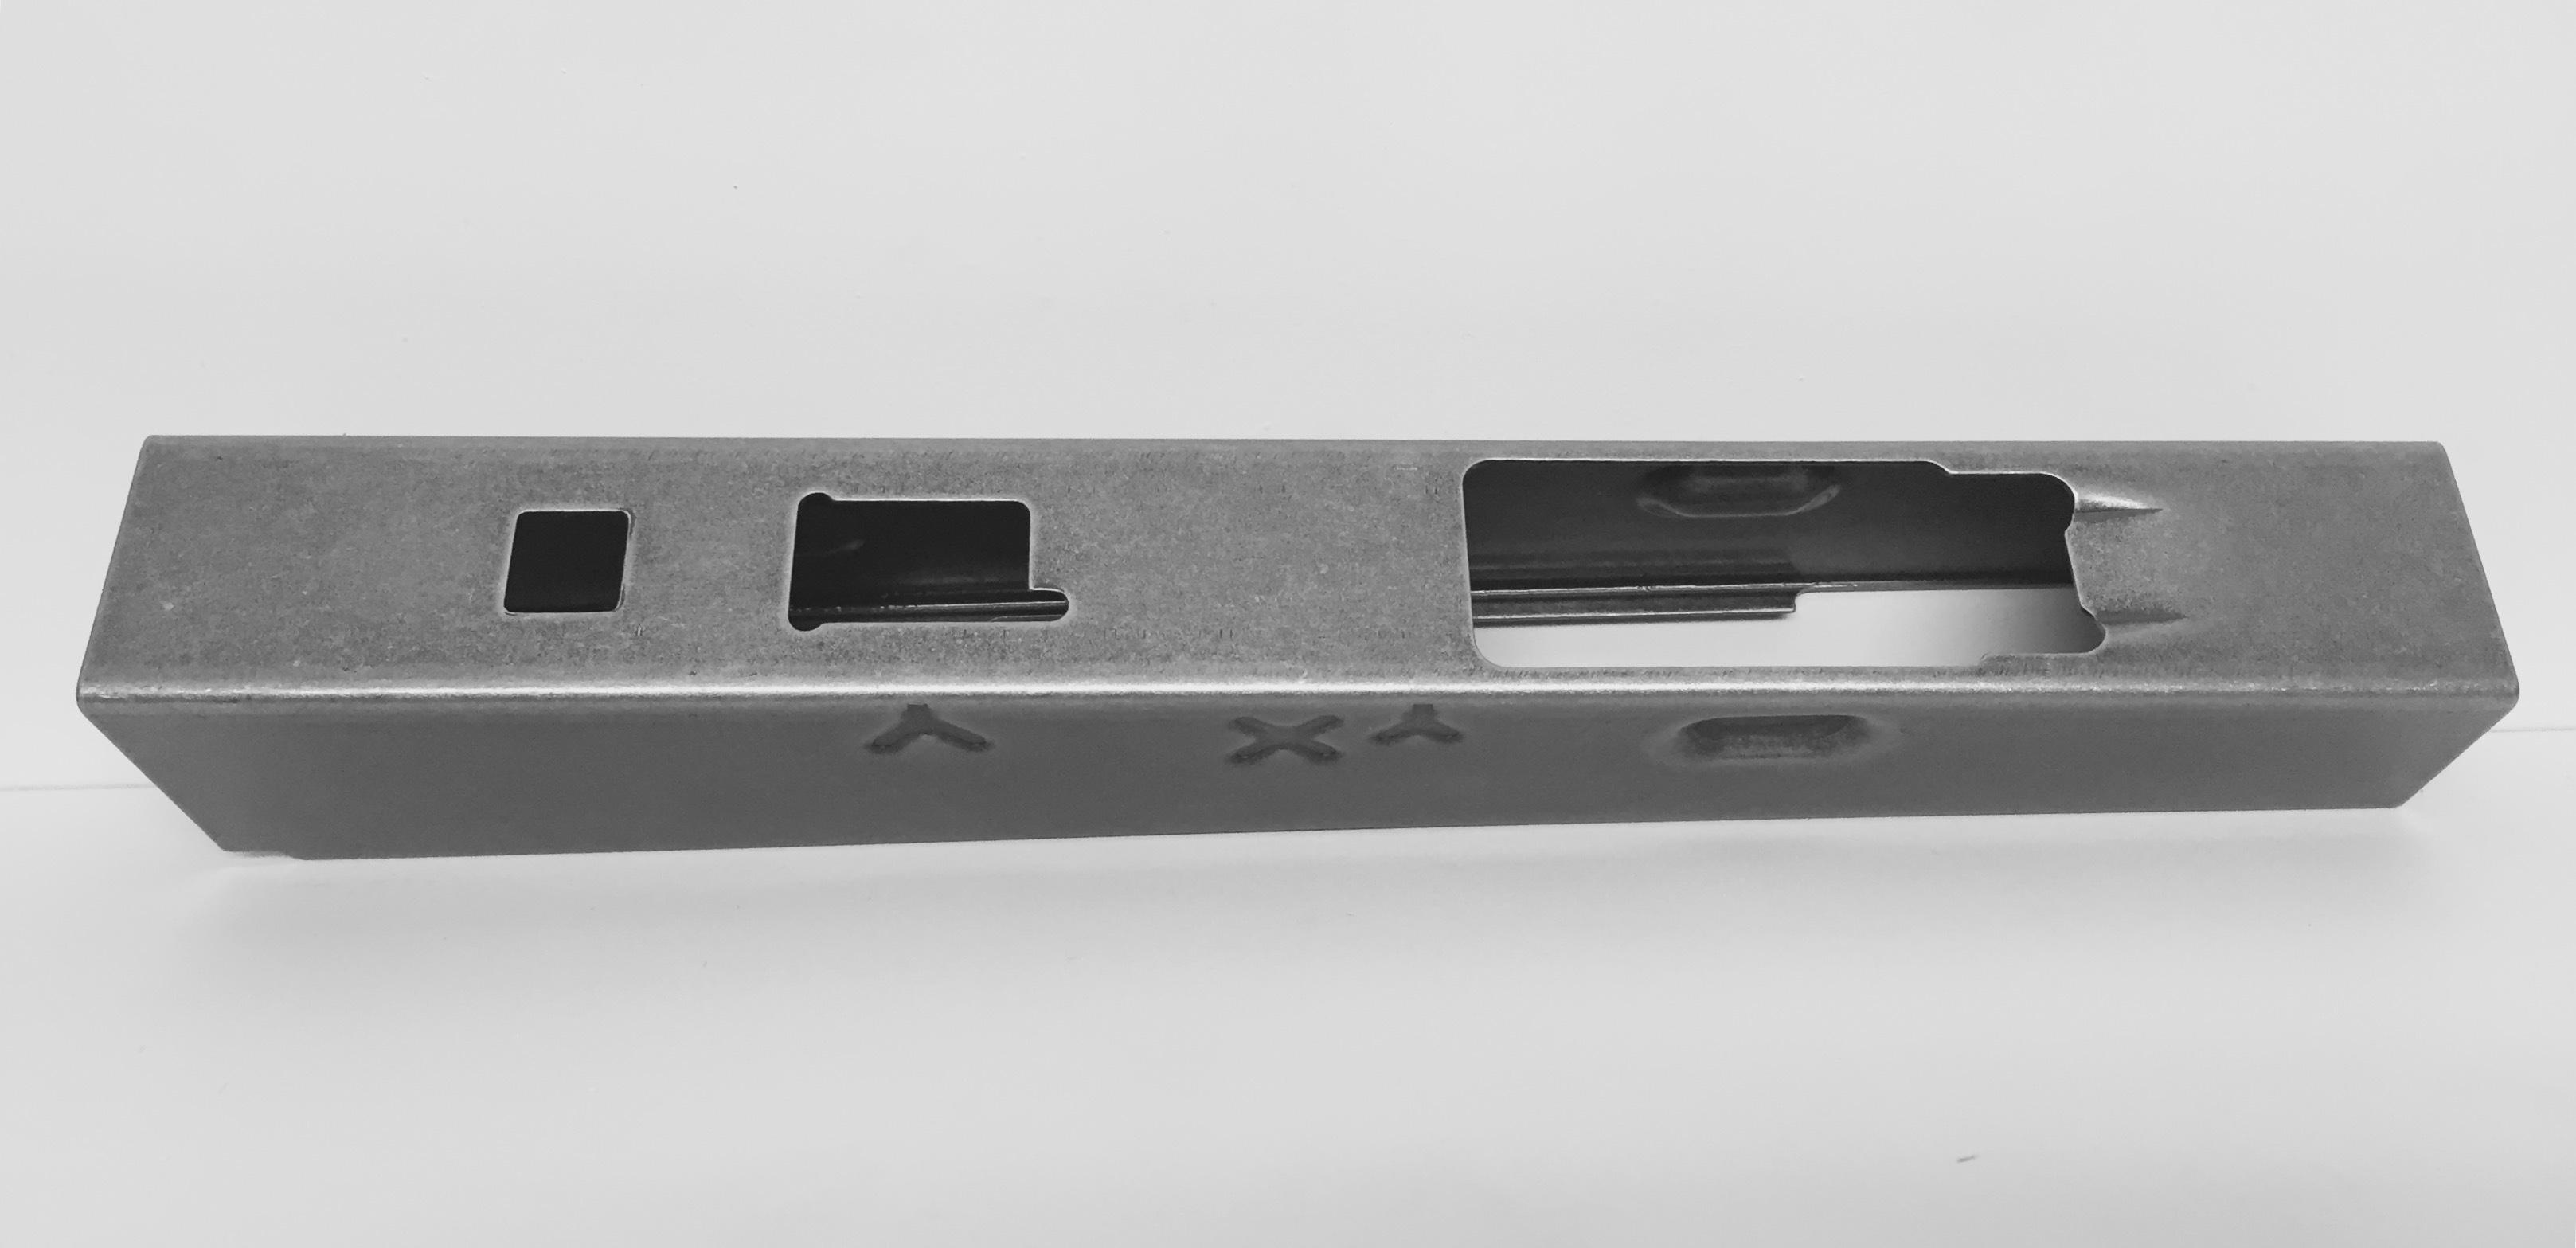 Ak 47 80 receiver - Hungarian Ak Blank Right Side View Hungarian Ak Blank Bottom View